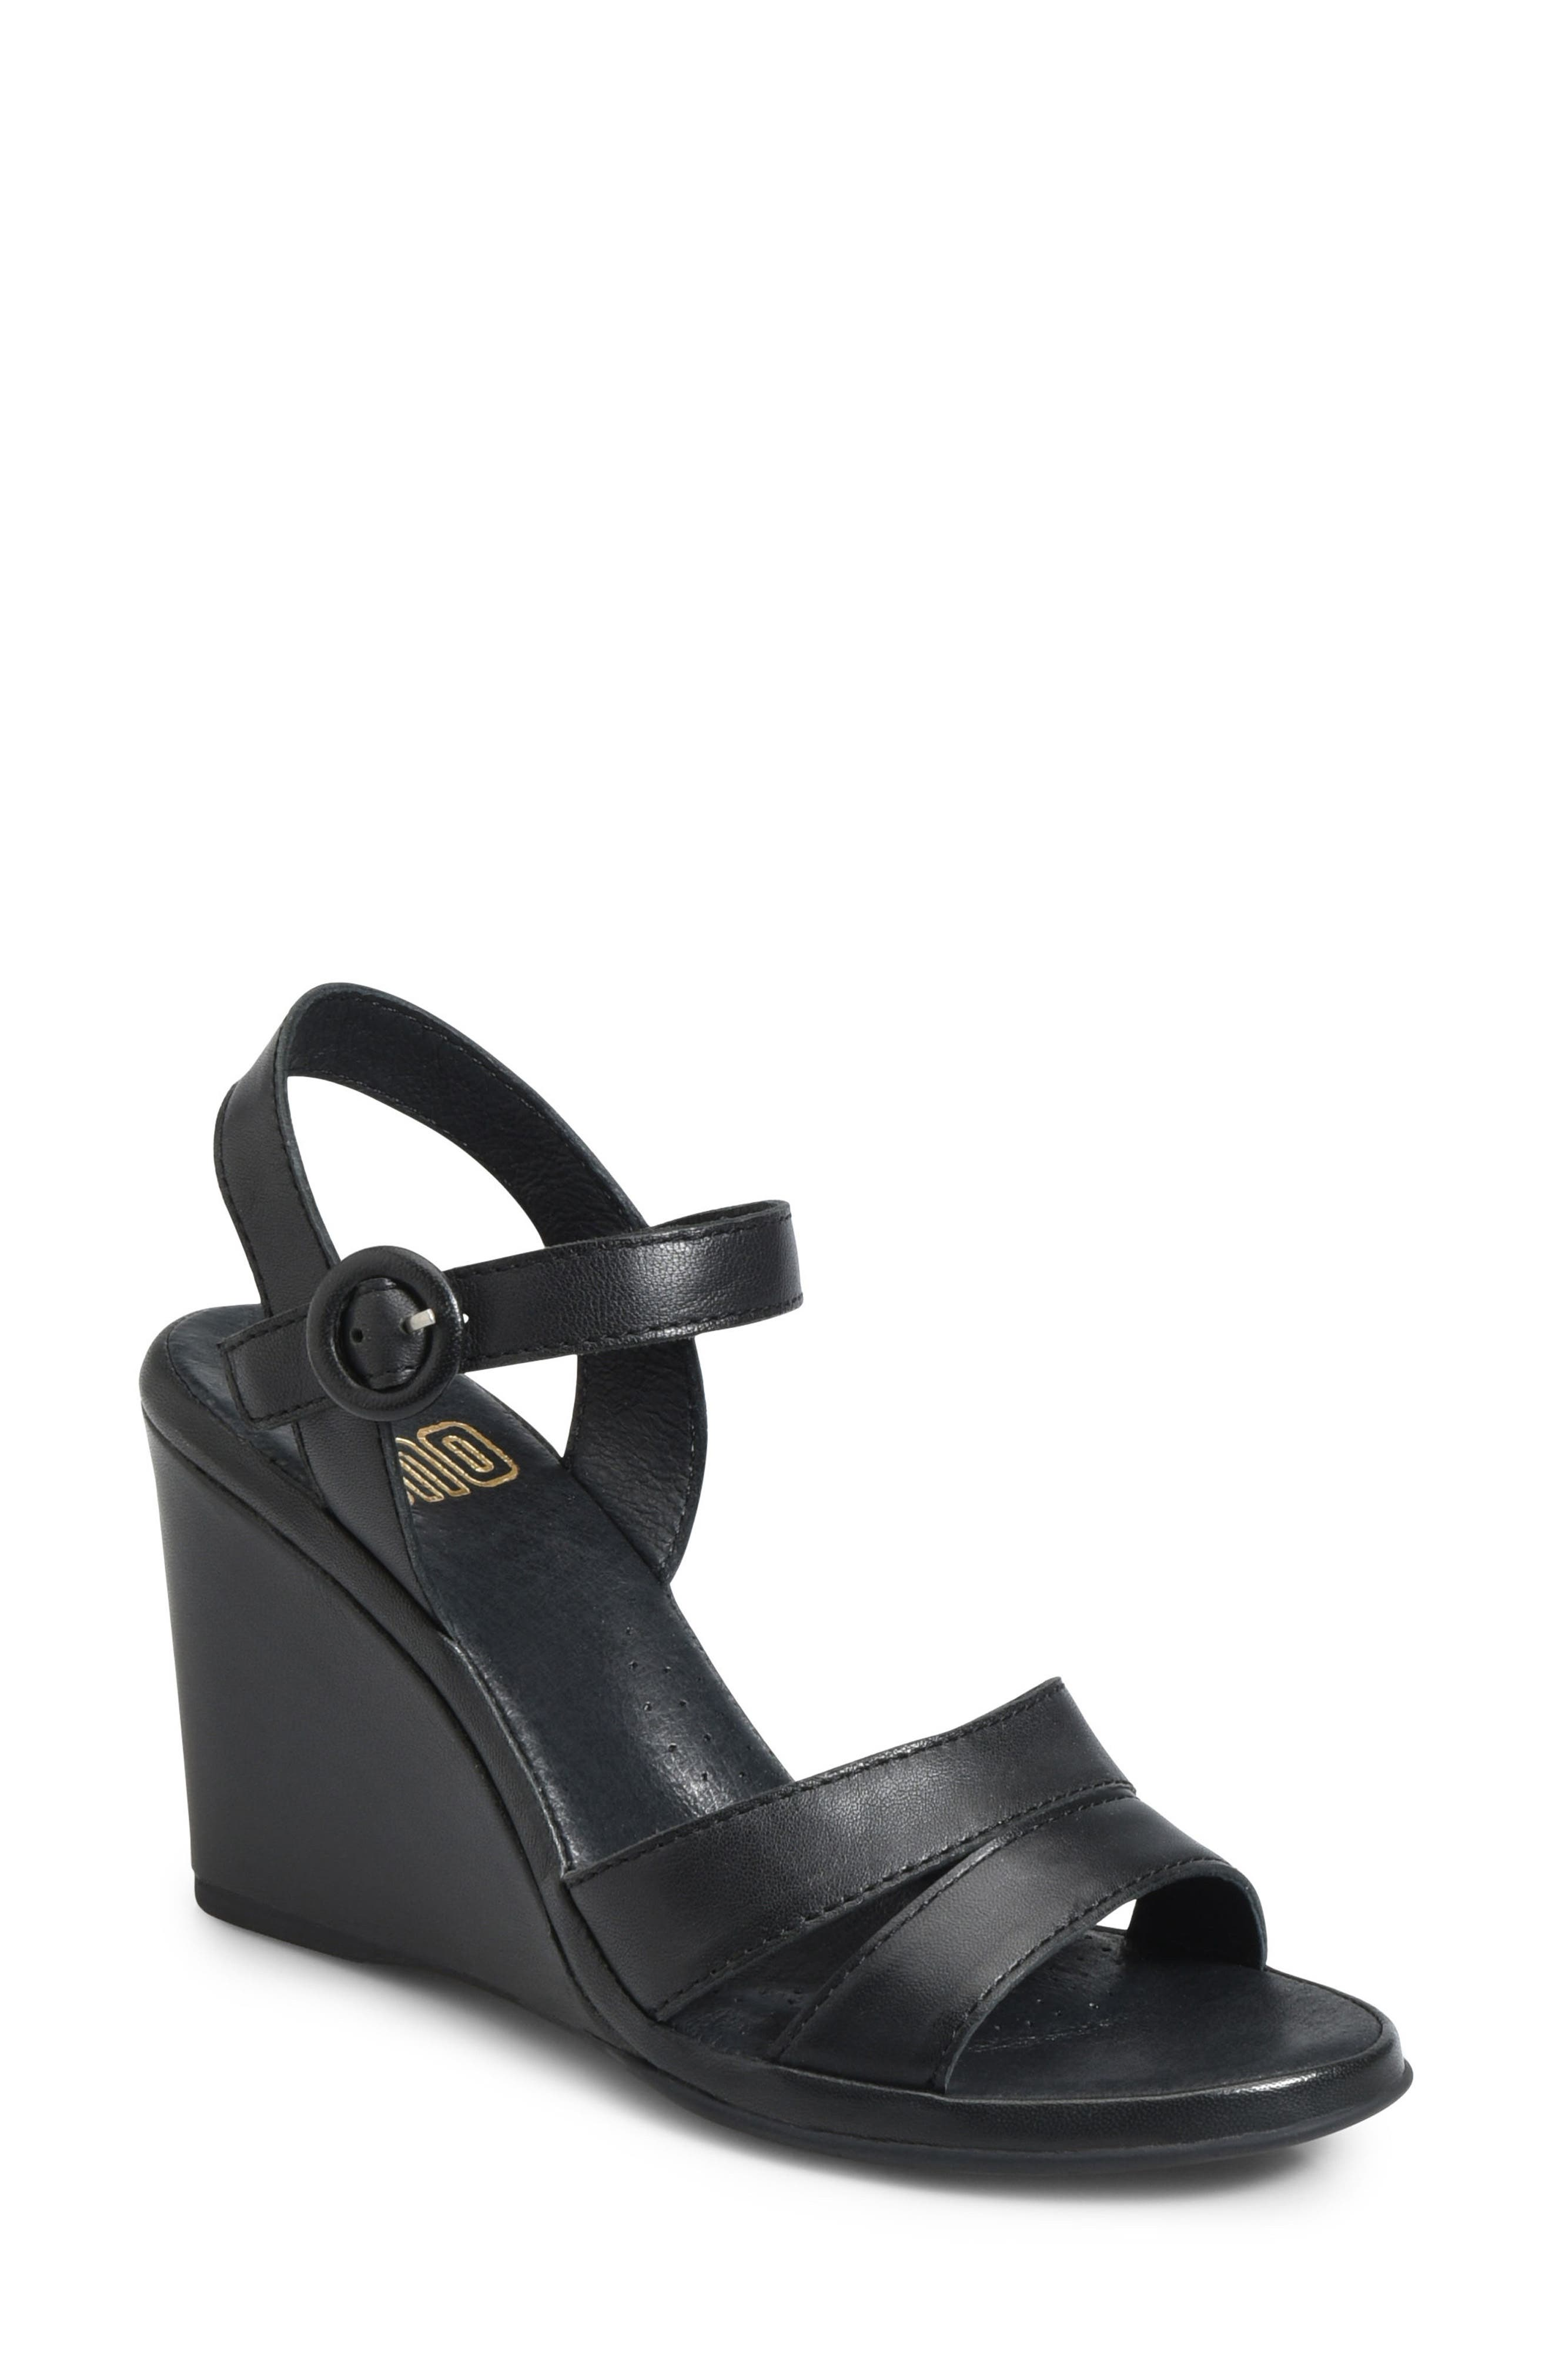 Ono Hydro Wedge Sandal, Black